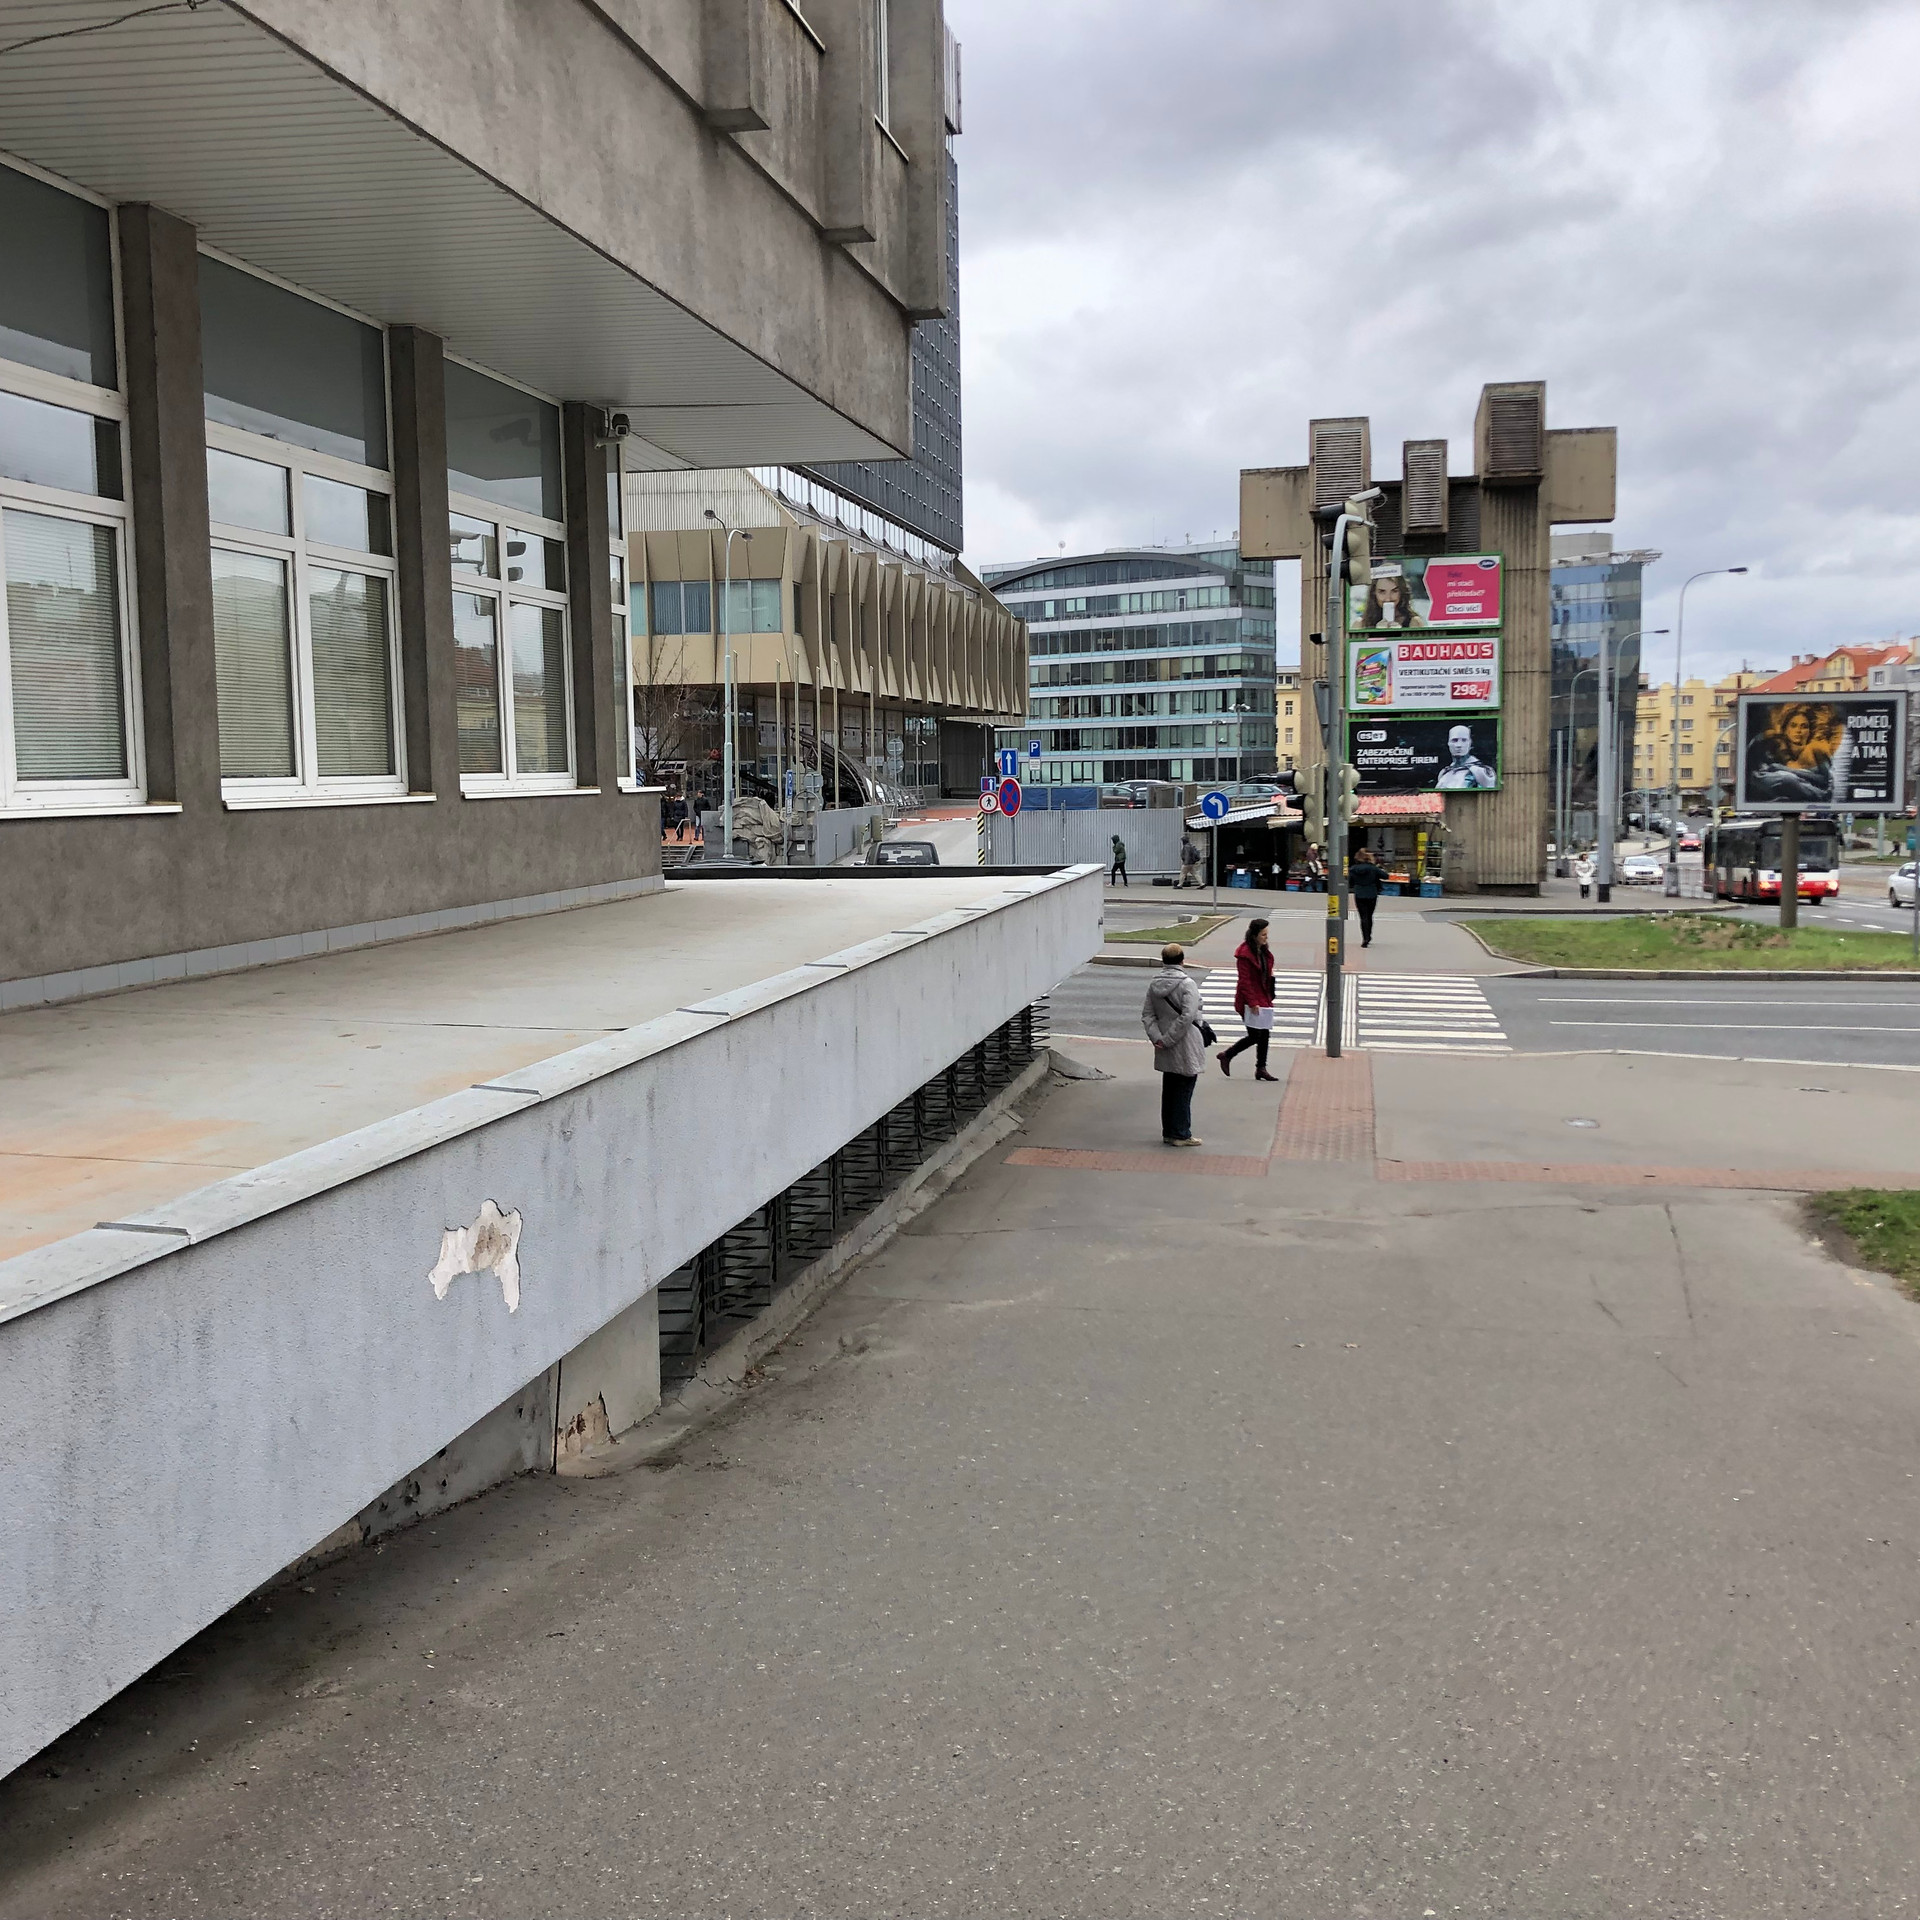 Gap over the ledge  